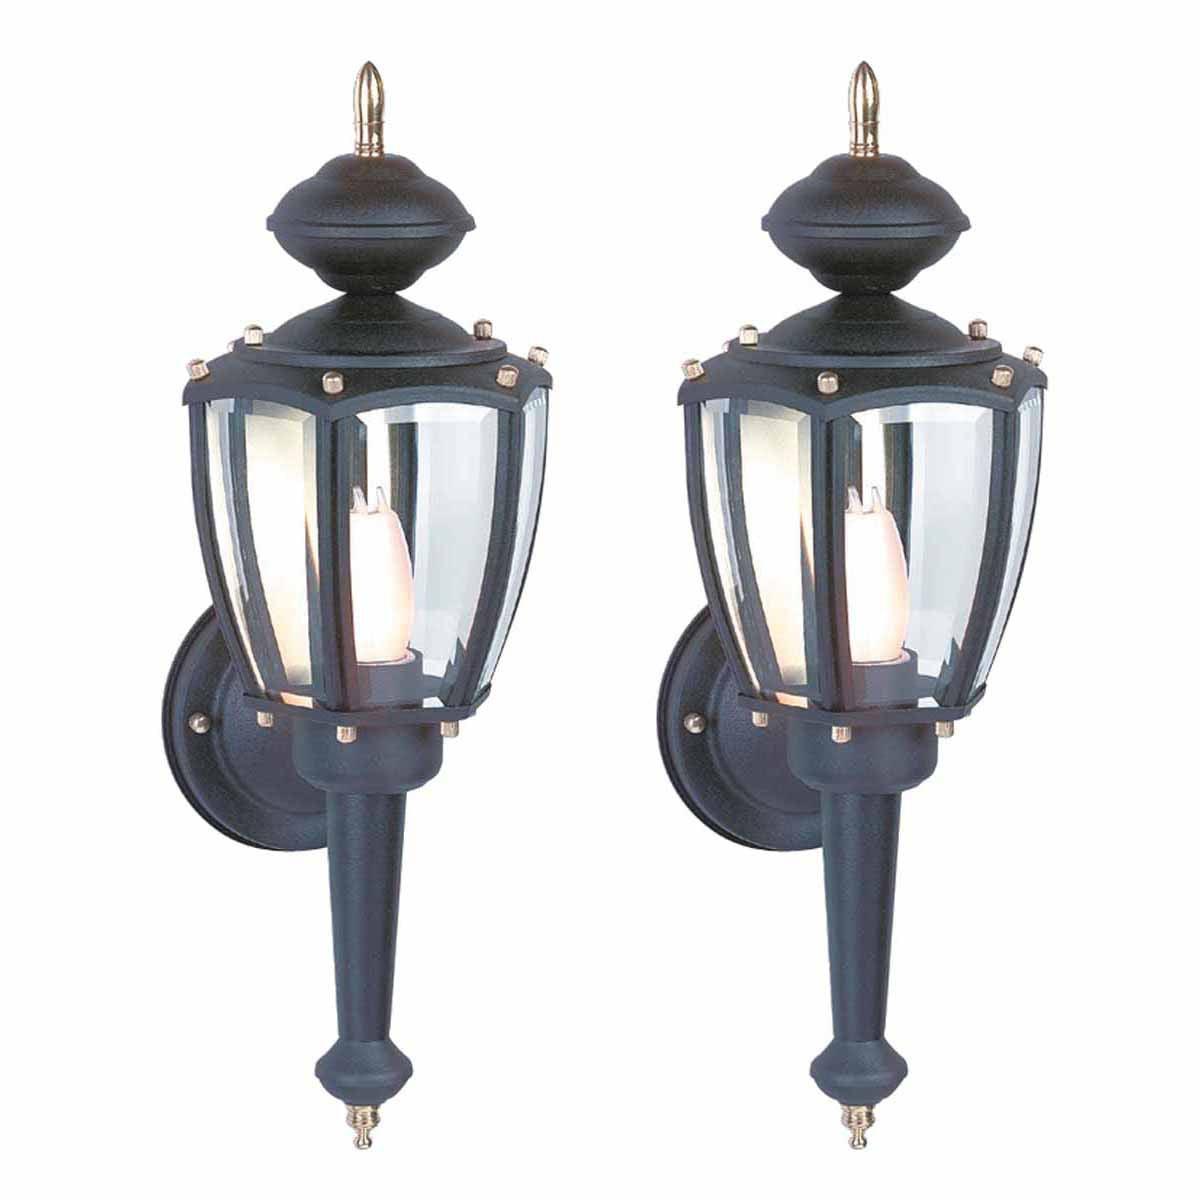 2 Outdoor Lighting Black Aluminum 5 Panel Outdoor Lamp | Renovator's Supply by The Renovator's Supply